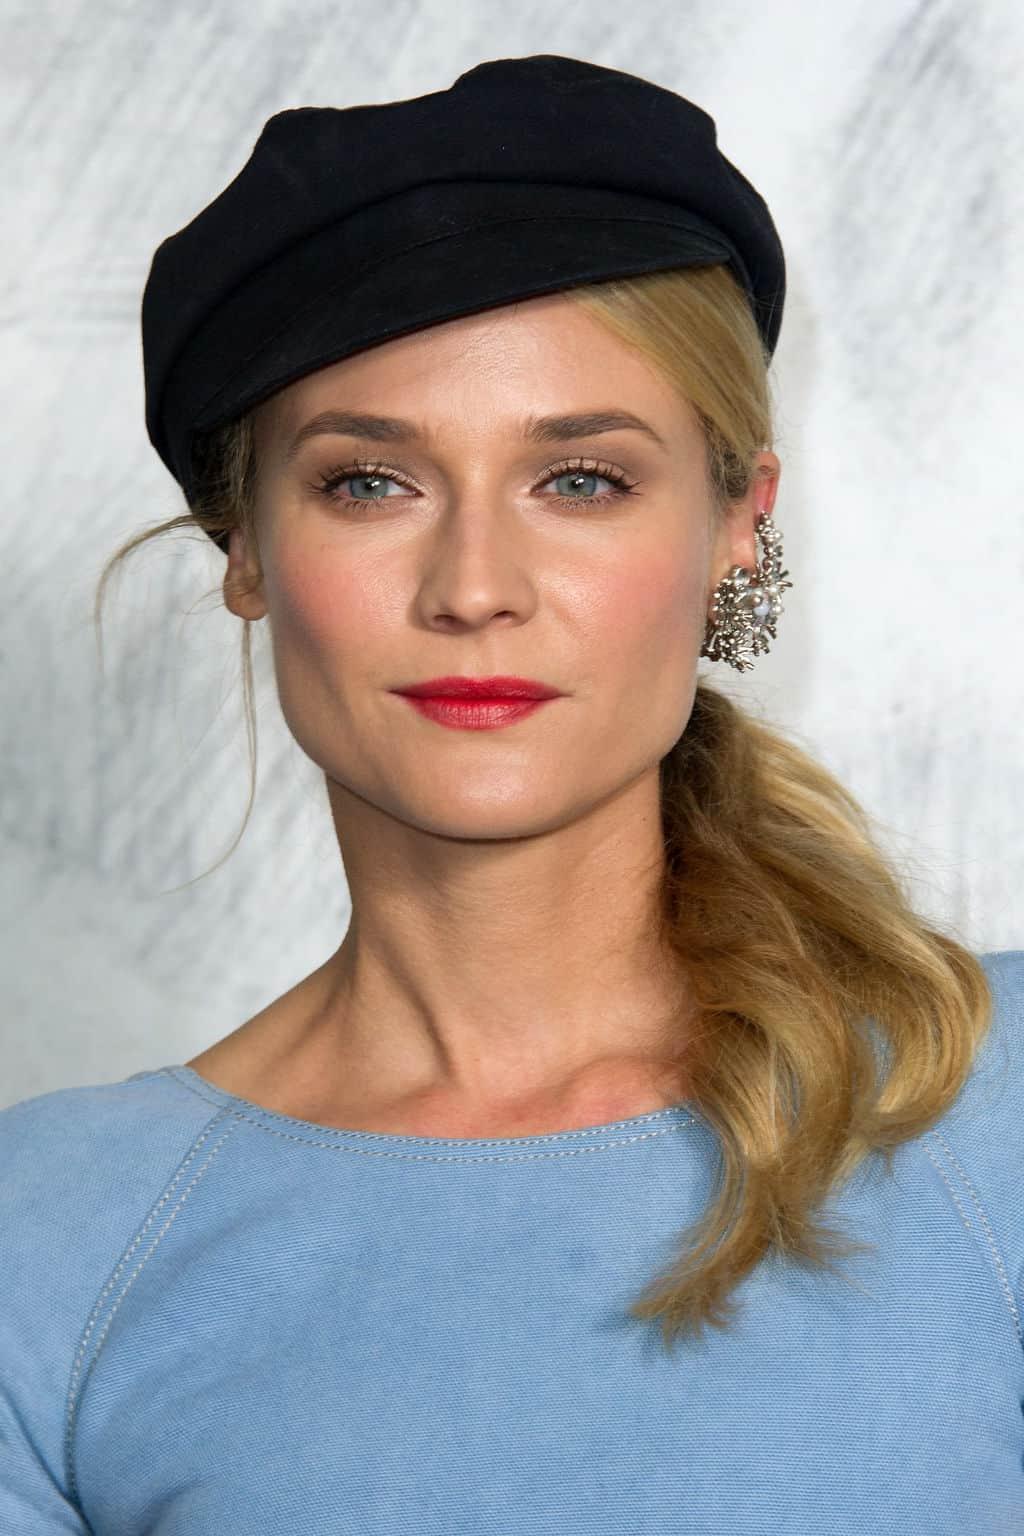 Diane-Kruger-in-Chanel-ear-cuffs